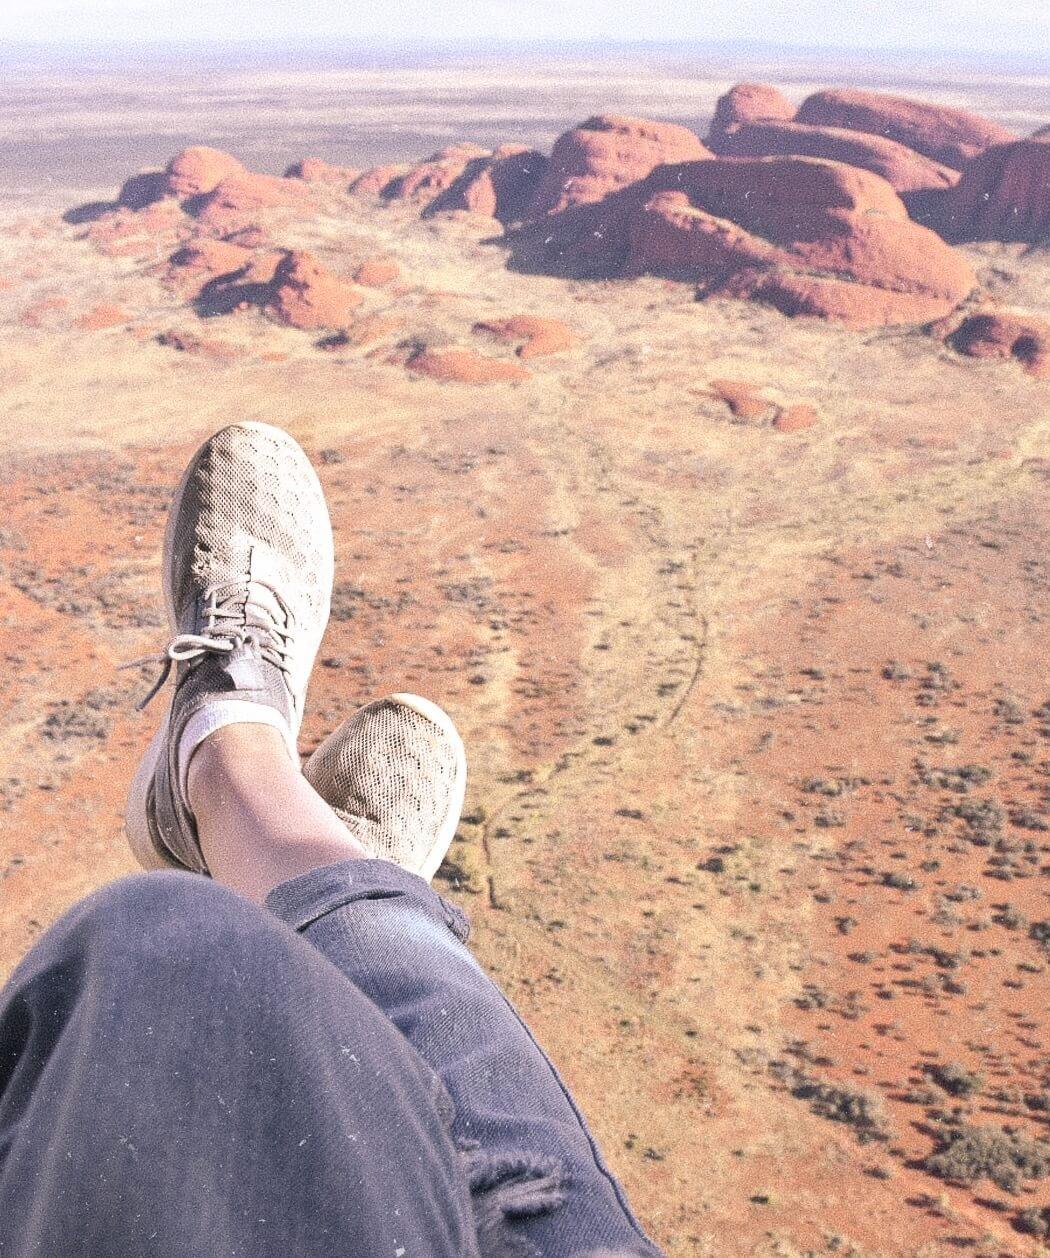 10 CONVINCING REASONS TO VISIT AUSTRALIA